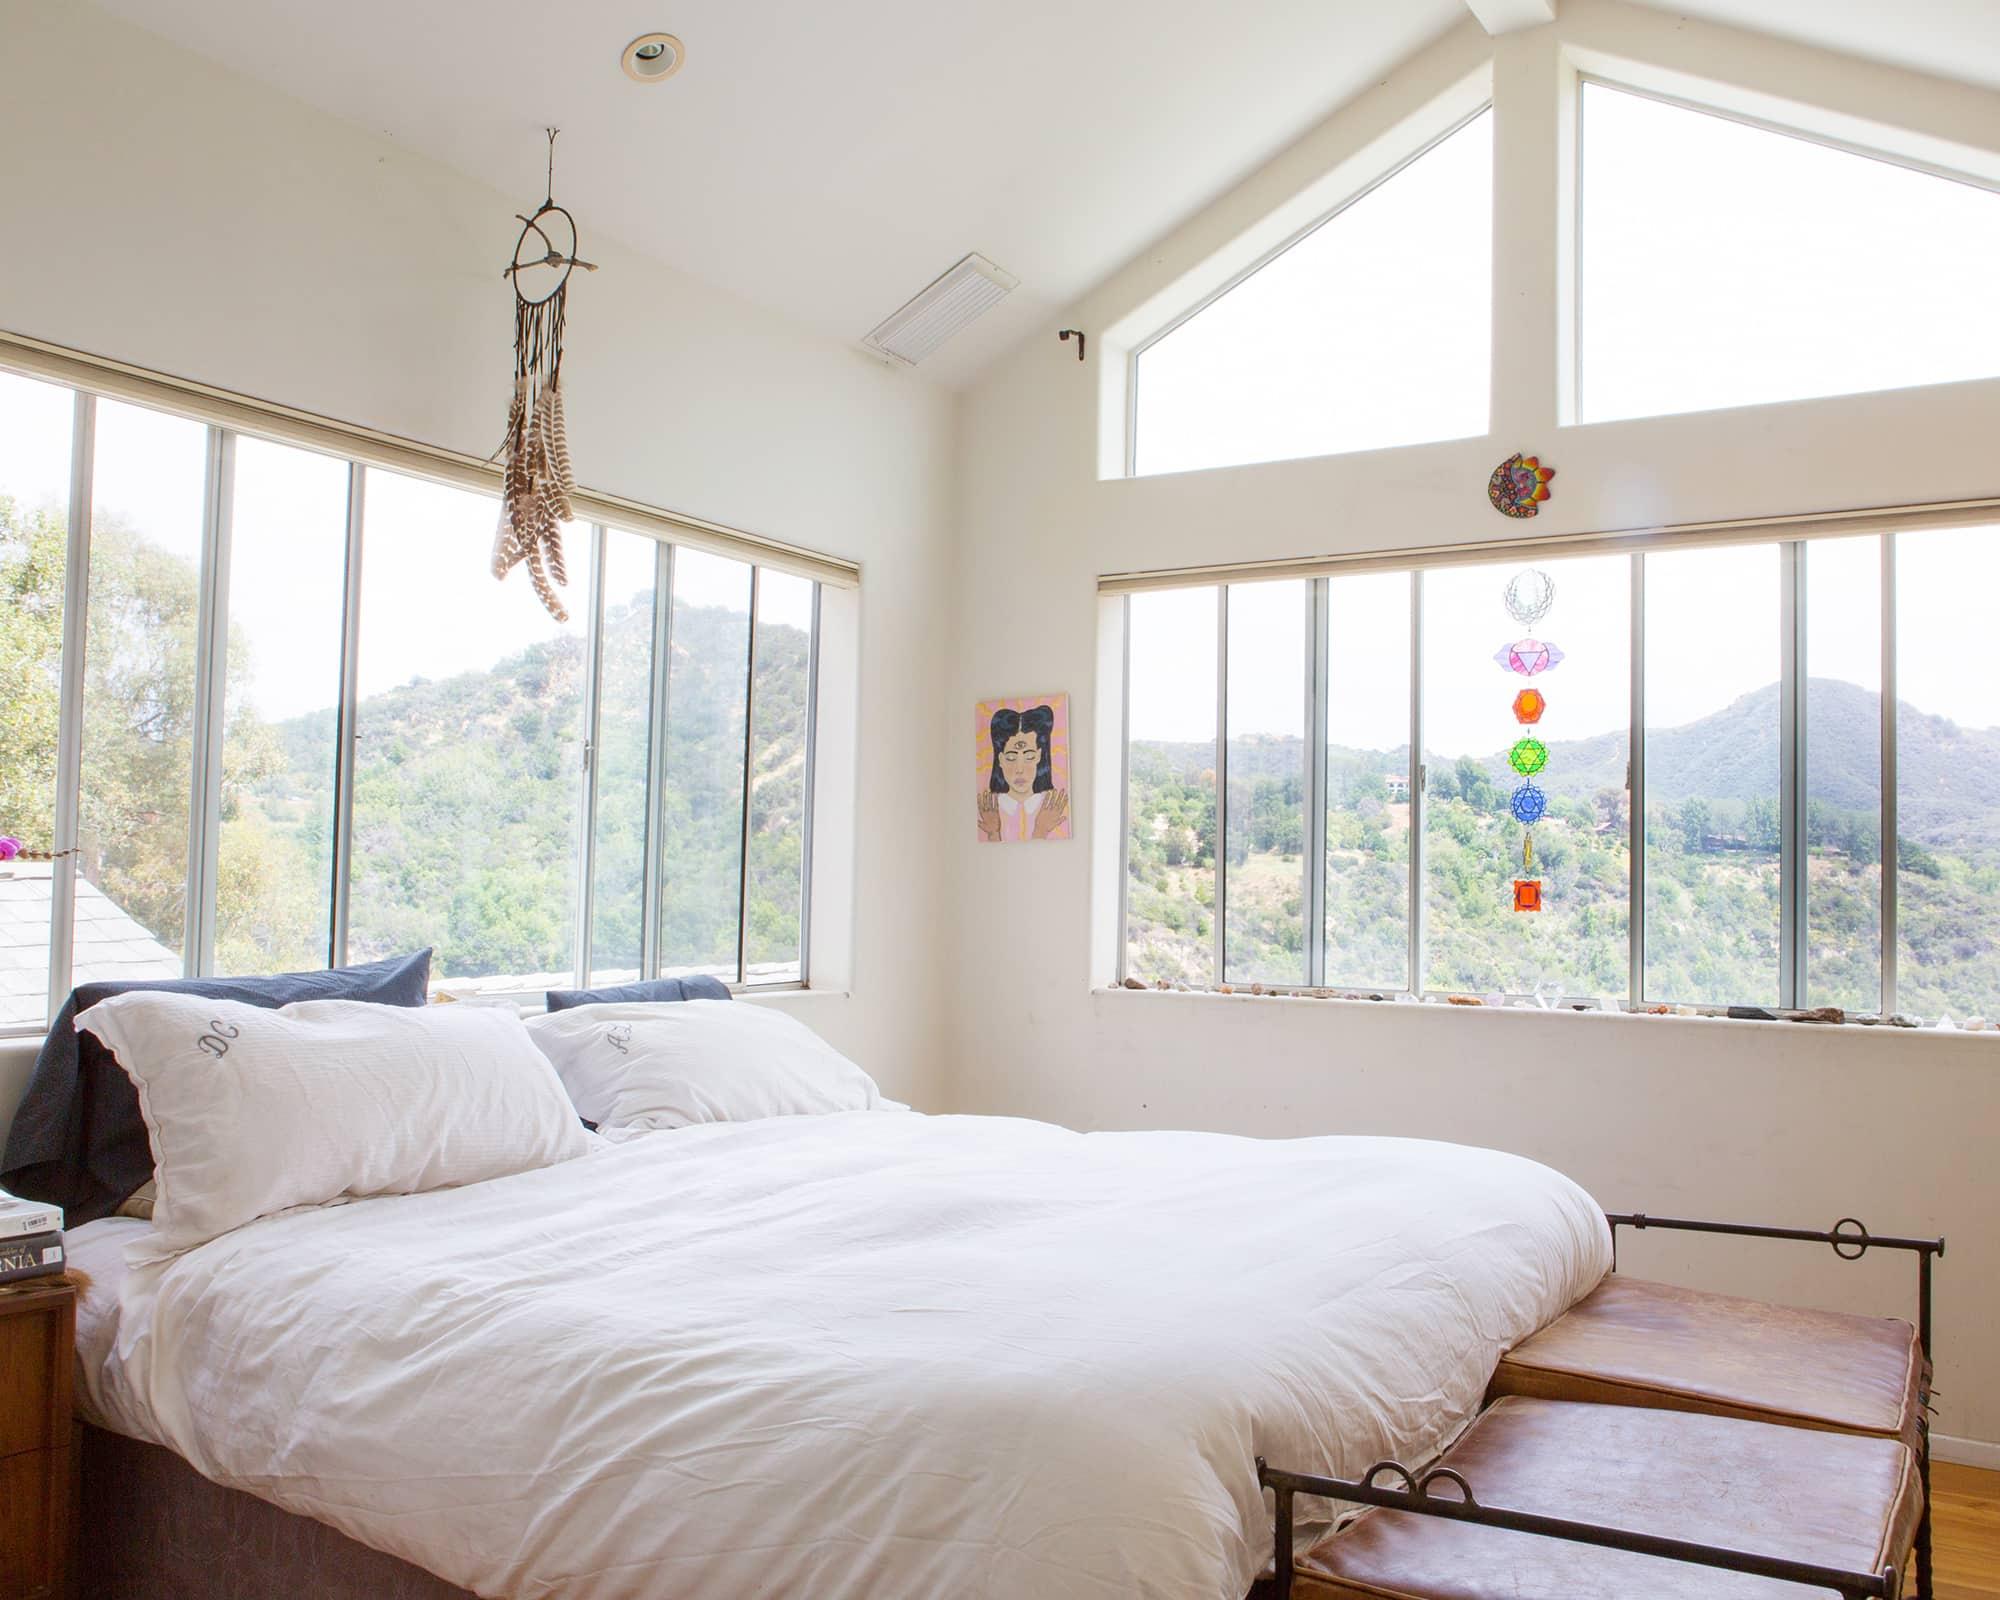 How to Fix 5 Common Bedroom Design Problems | Apartment ...